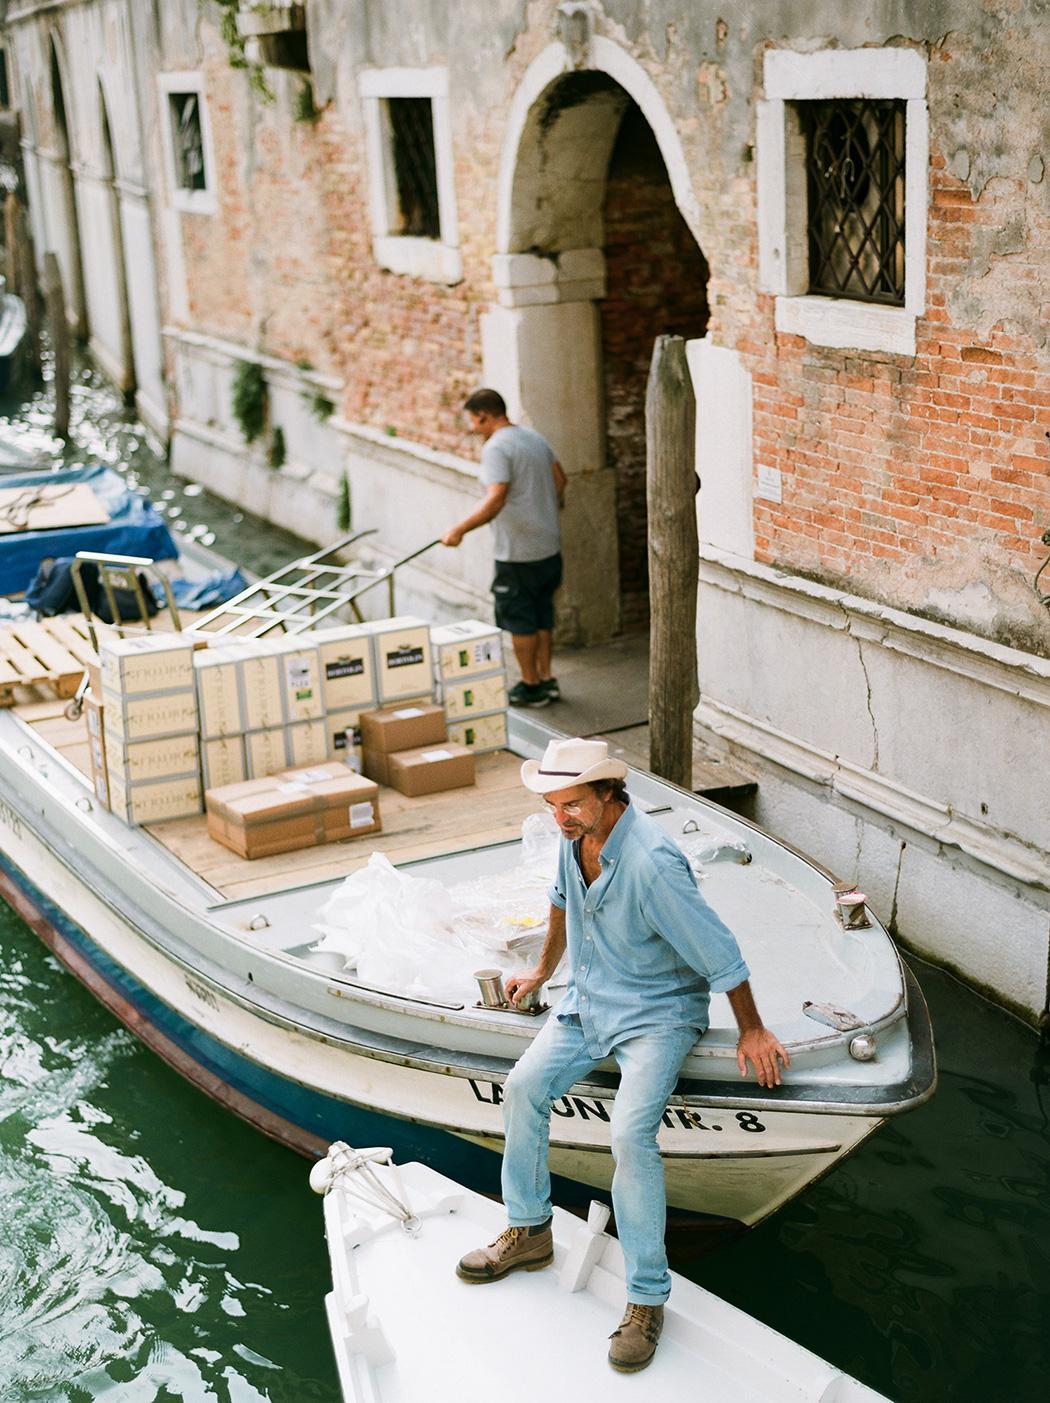 069S&E_Venice.jpg